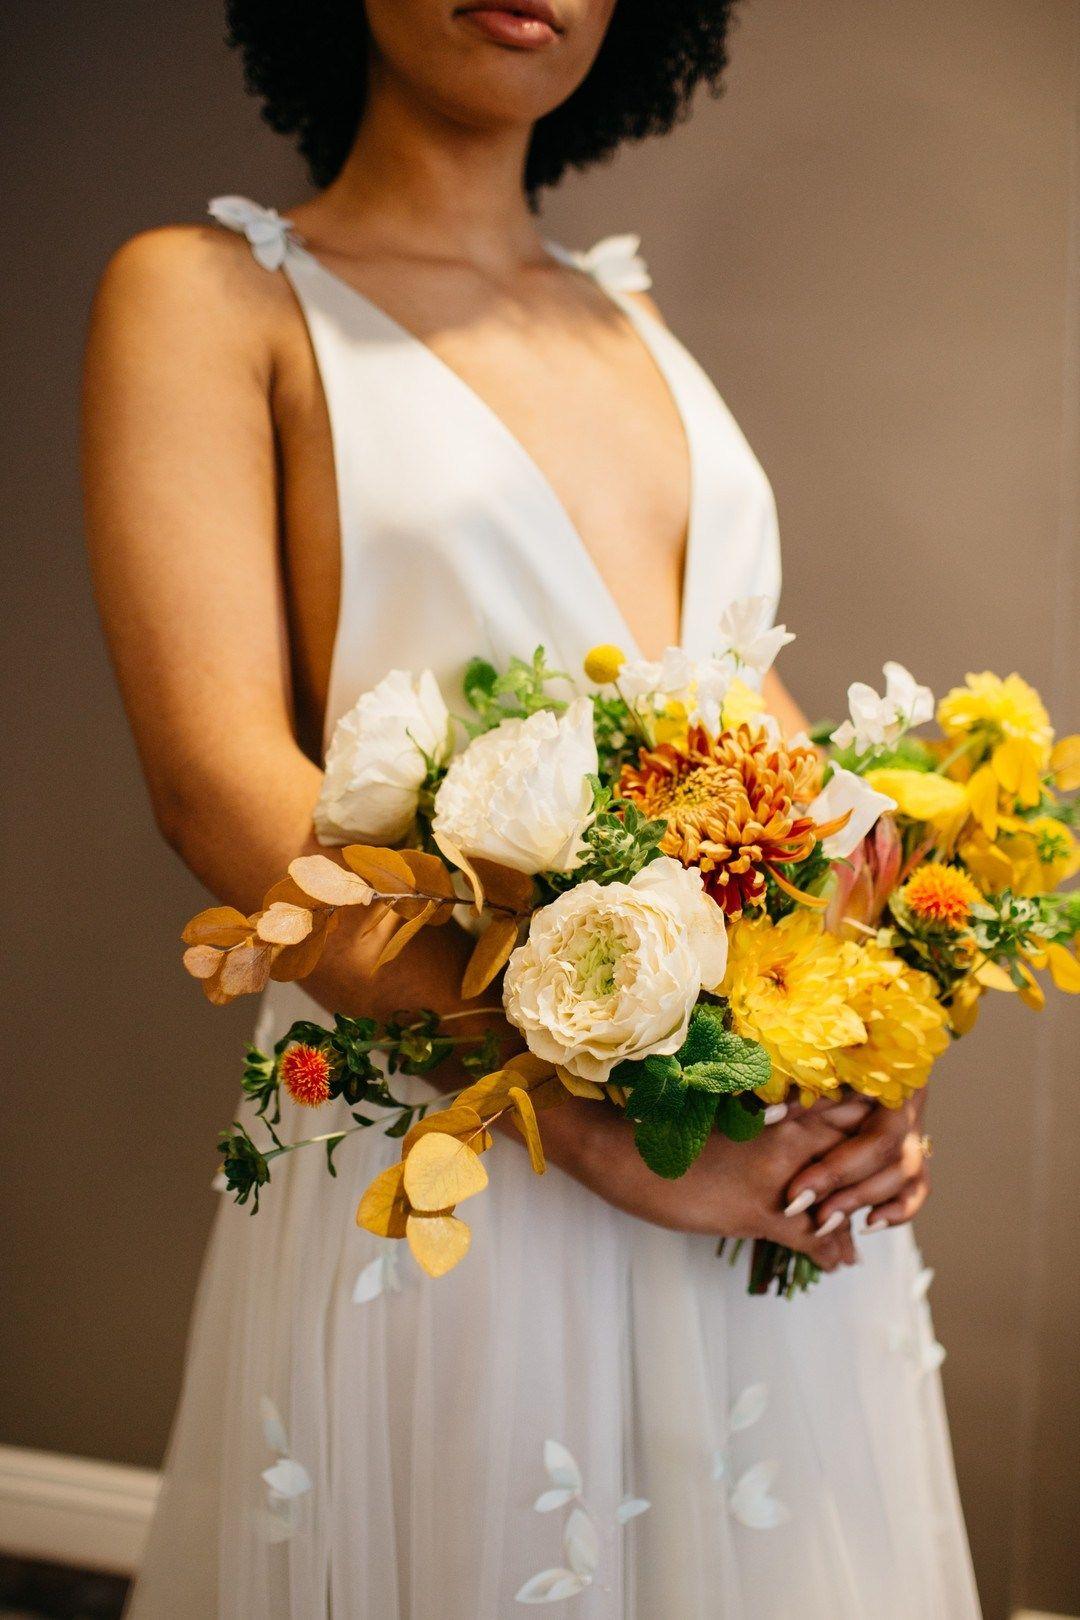 wes anderson travel themed wedding ideas flower power wedding rh pinterest com